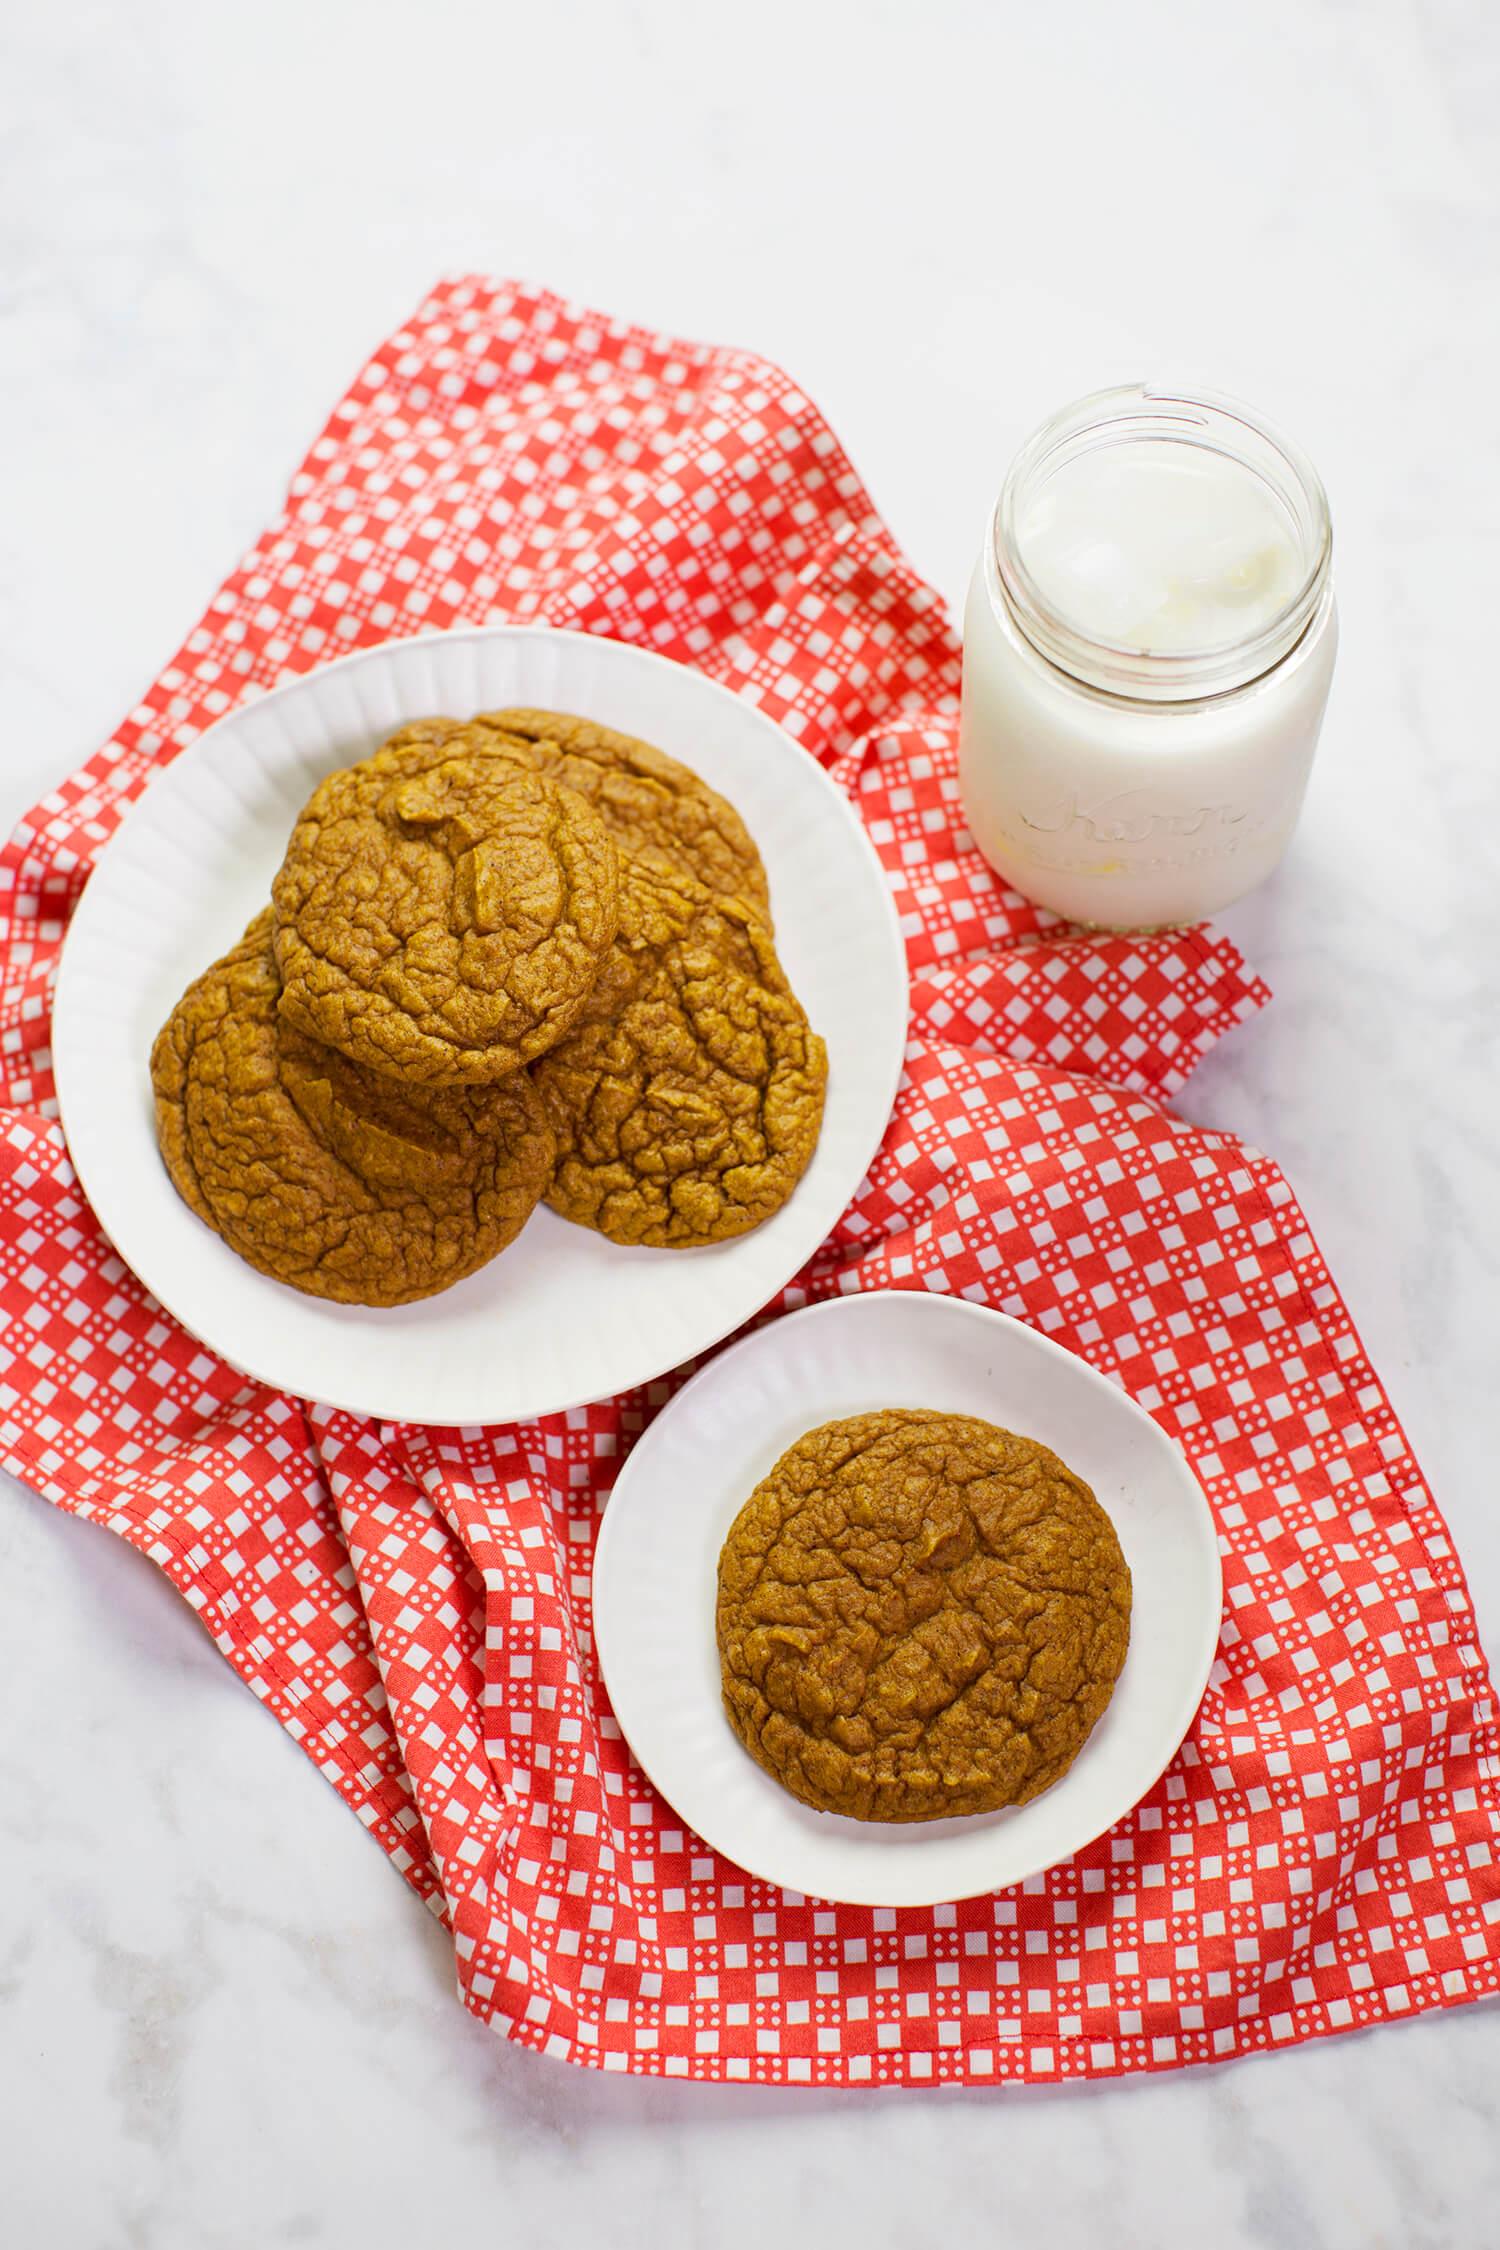 Grain-free Pumpkin Blender Cookies (via sleekbawd.com)